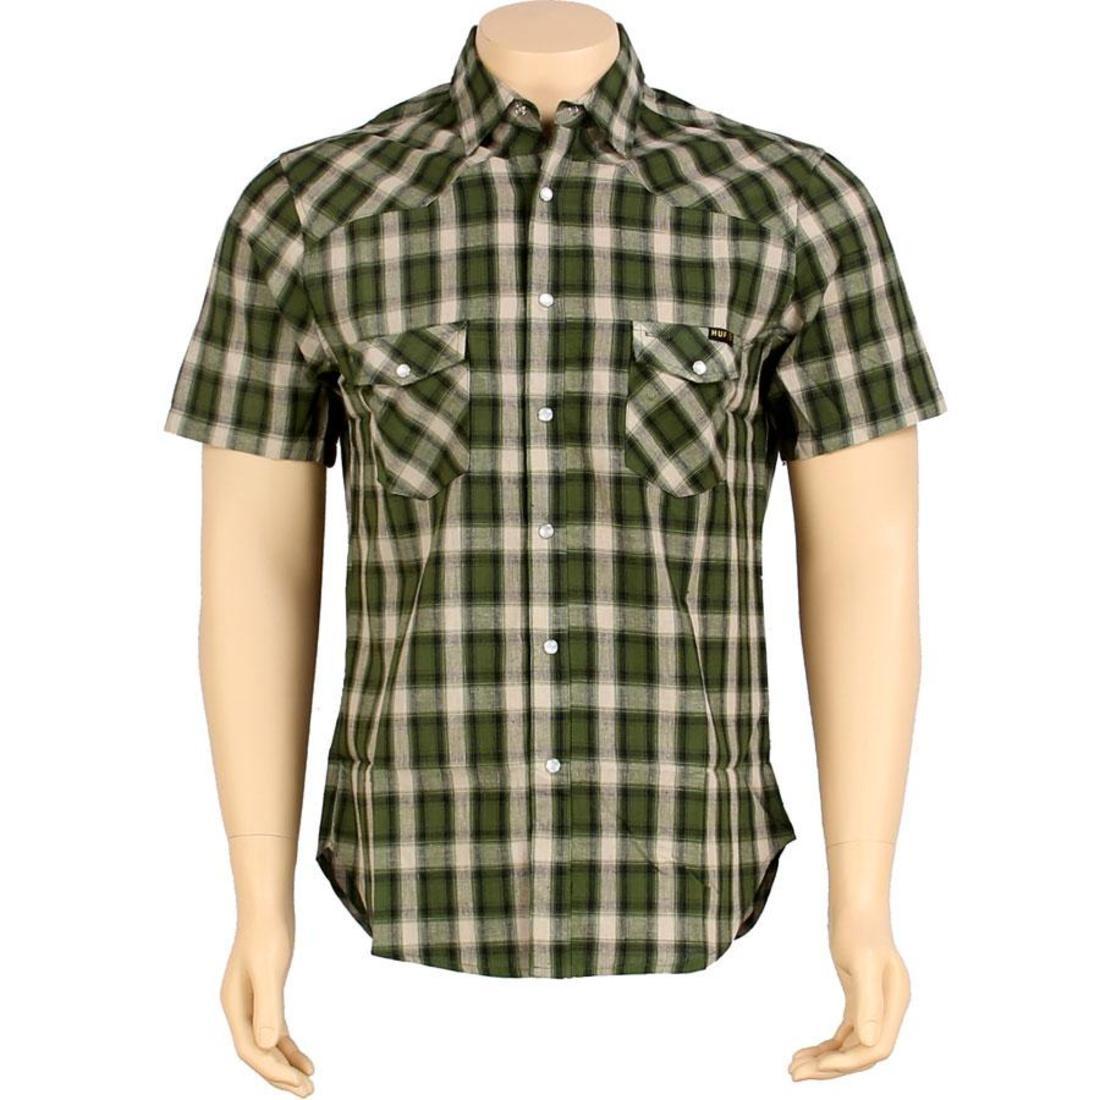 HUF ハフ 緑 グリーン 【 HUF GREEN THE SHEA SHIRT 】 メンズファッション トップス カジュアルシャツ